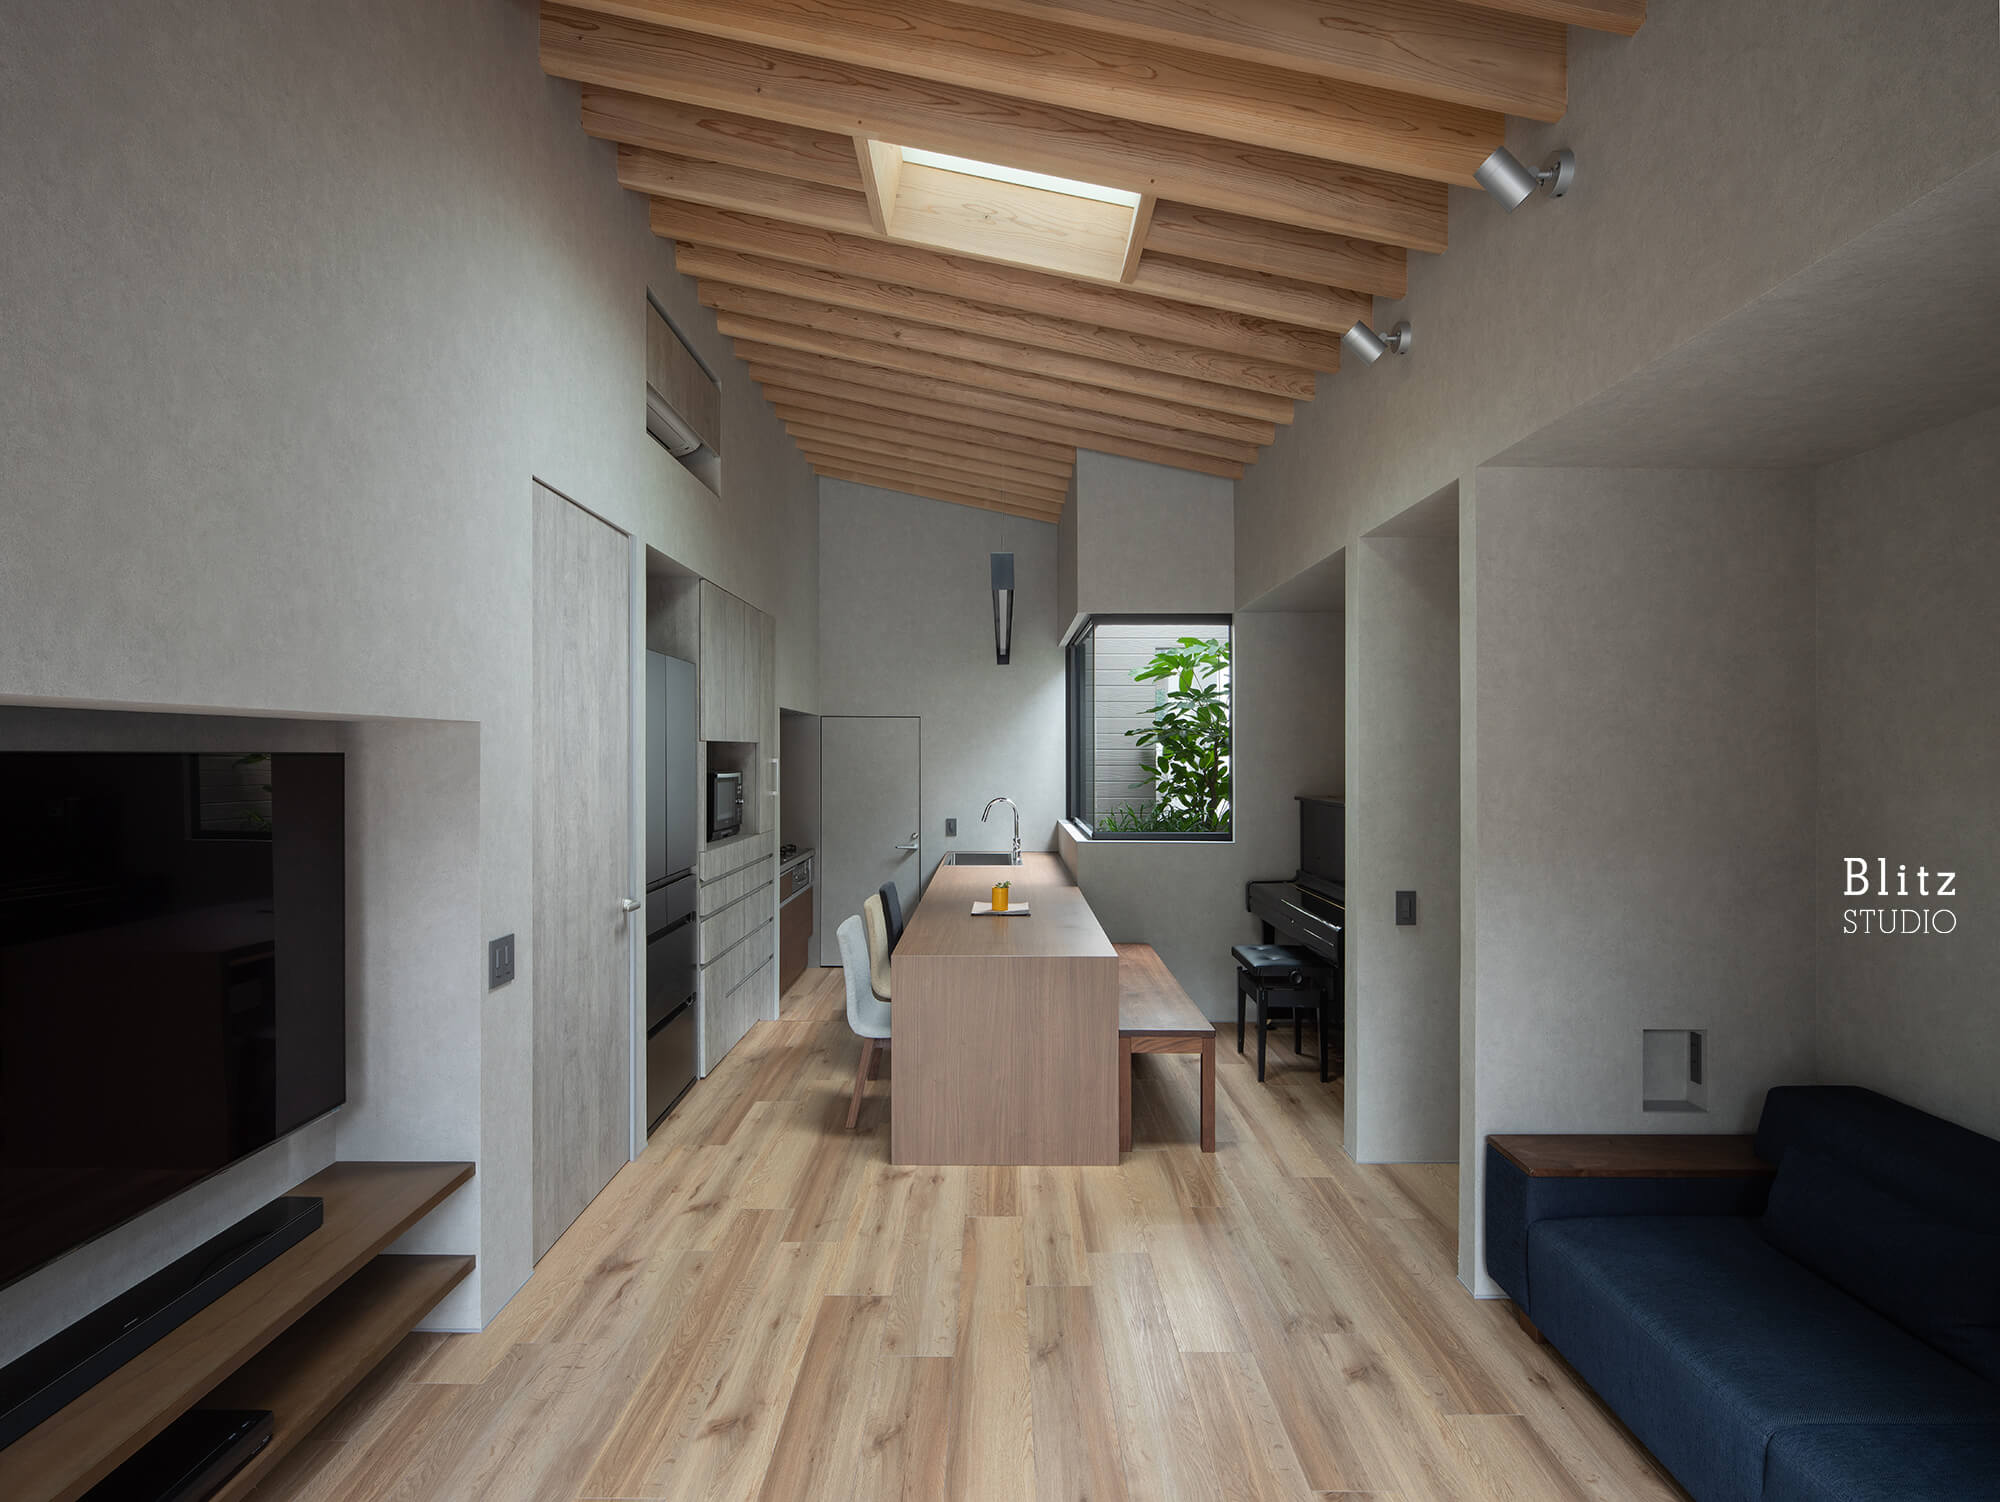 『鳩浜の家』-鹿児島県奄美市-建築写真・竣工写真・インテリア写真5